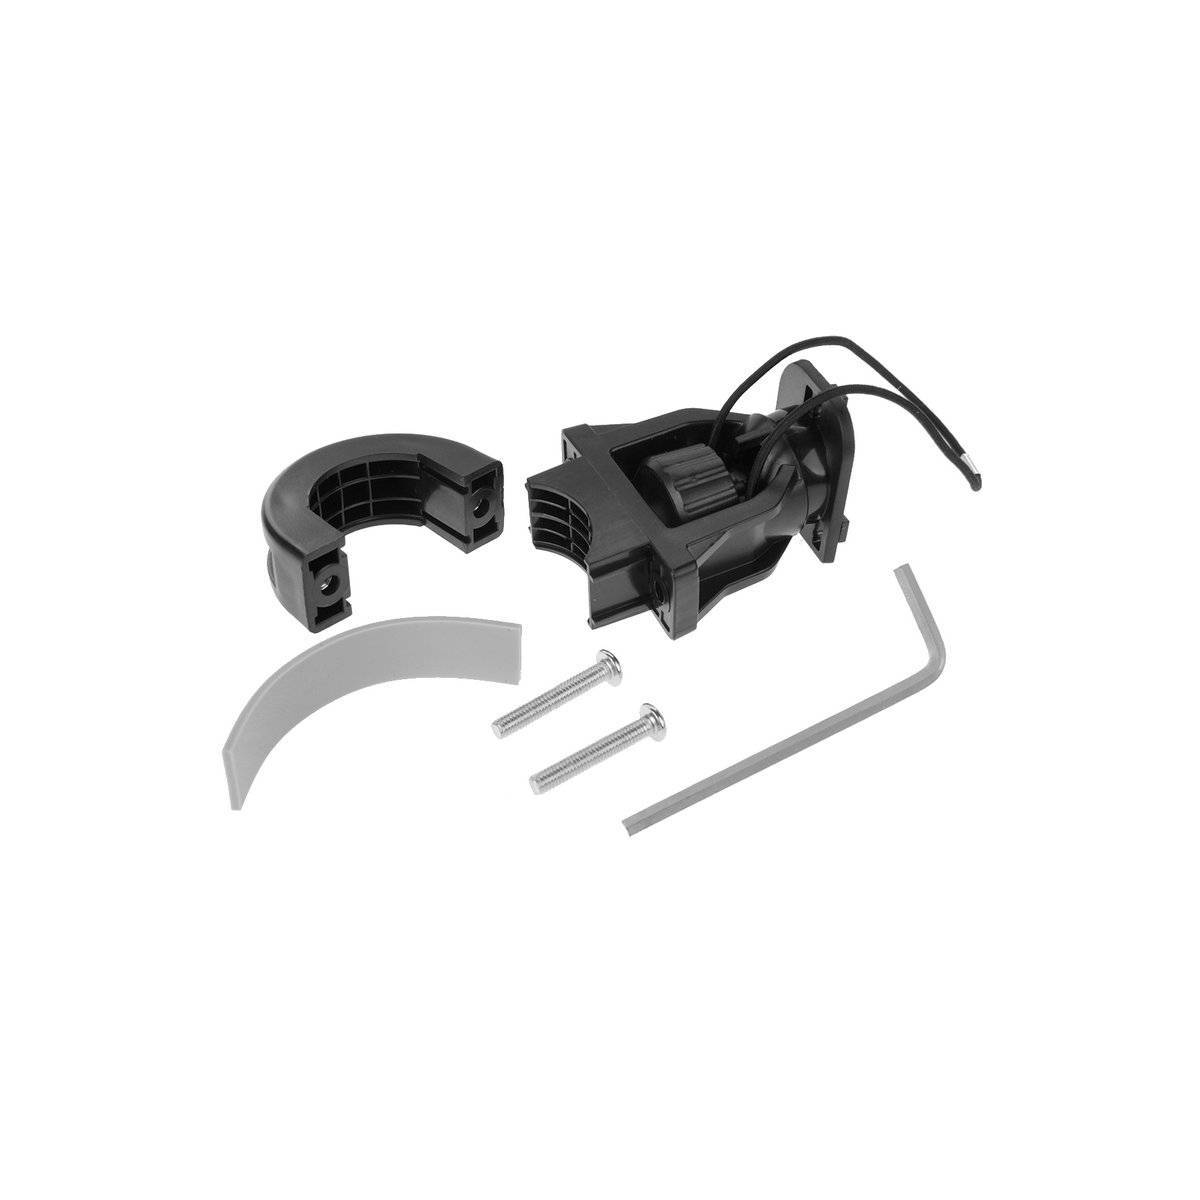 Vellidte iPhone cykel holder - MacKabler.dk fra Haweel UE-71